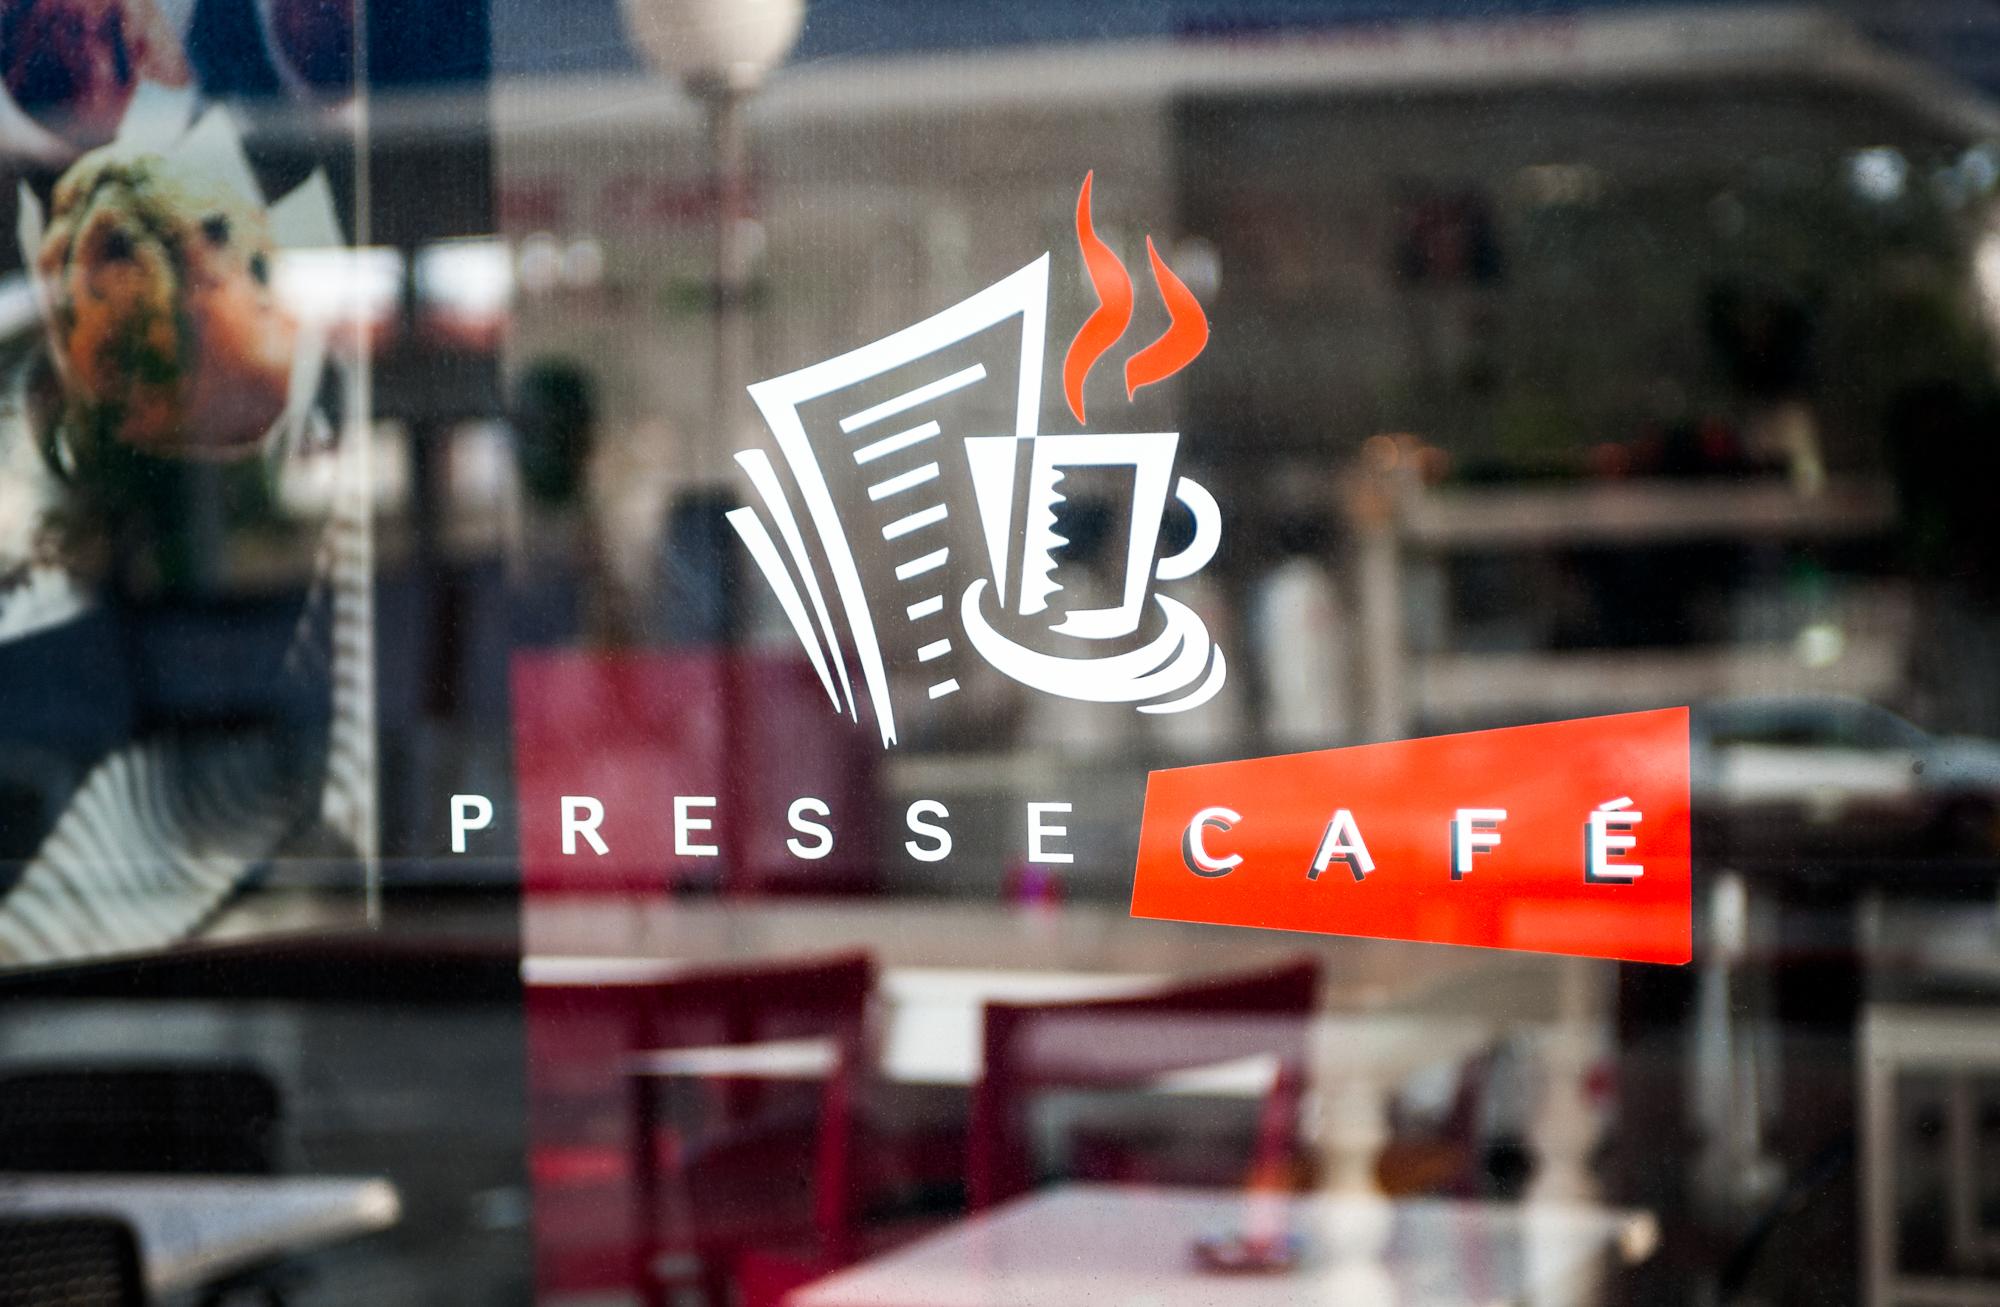 Press cafe blog-1.jpg